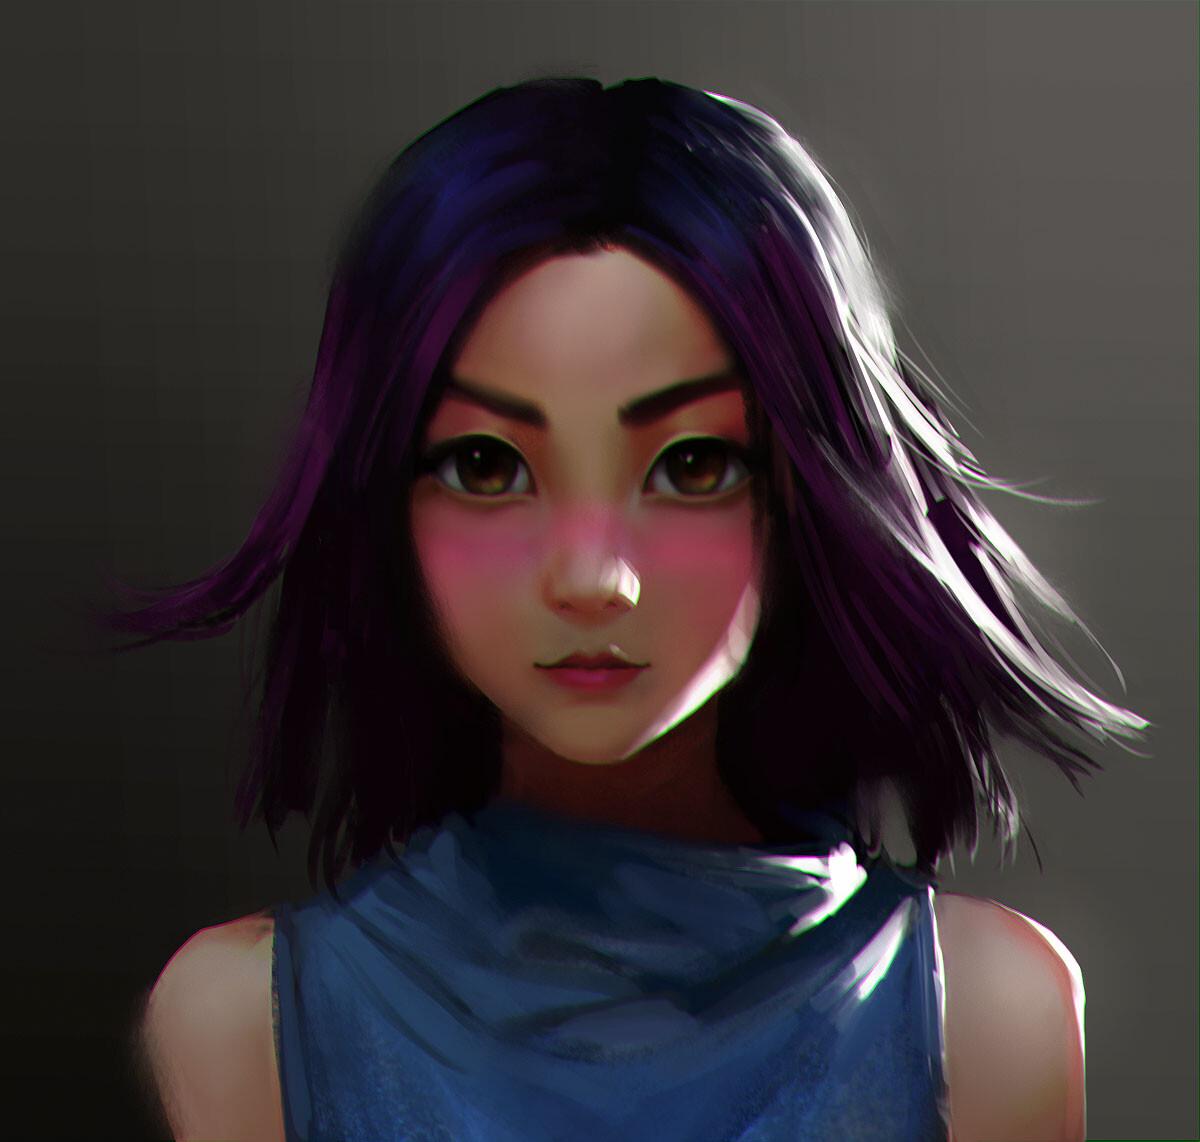 Faye's iconic blush look